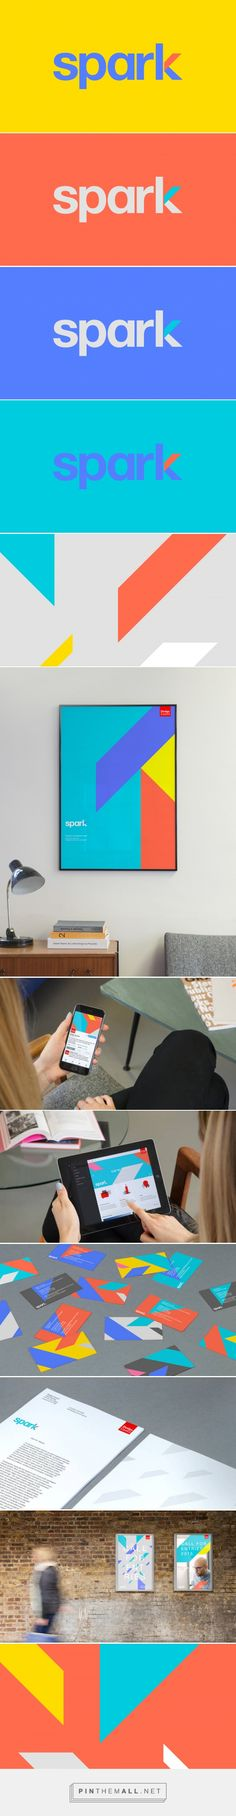 Design Council Spark | DesignStudio